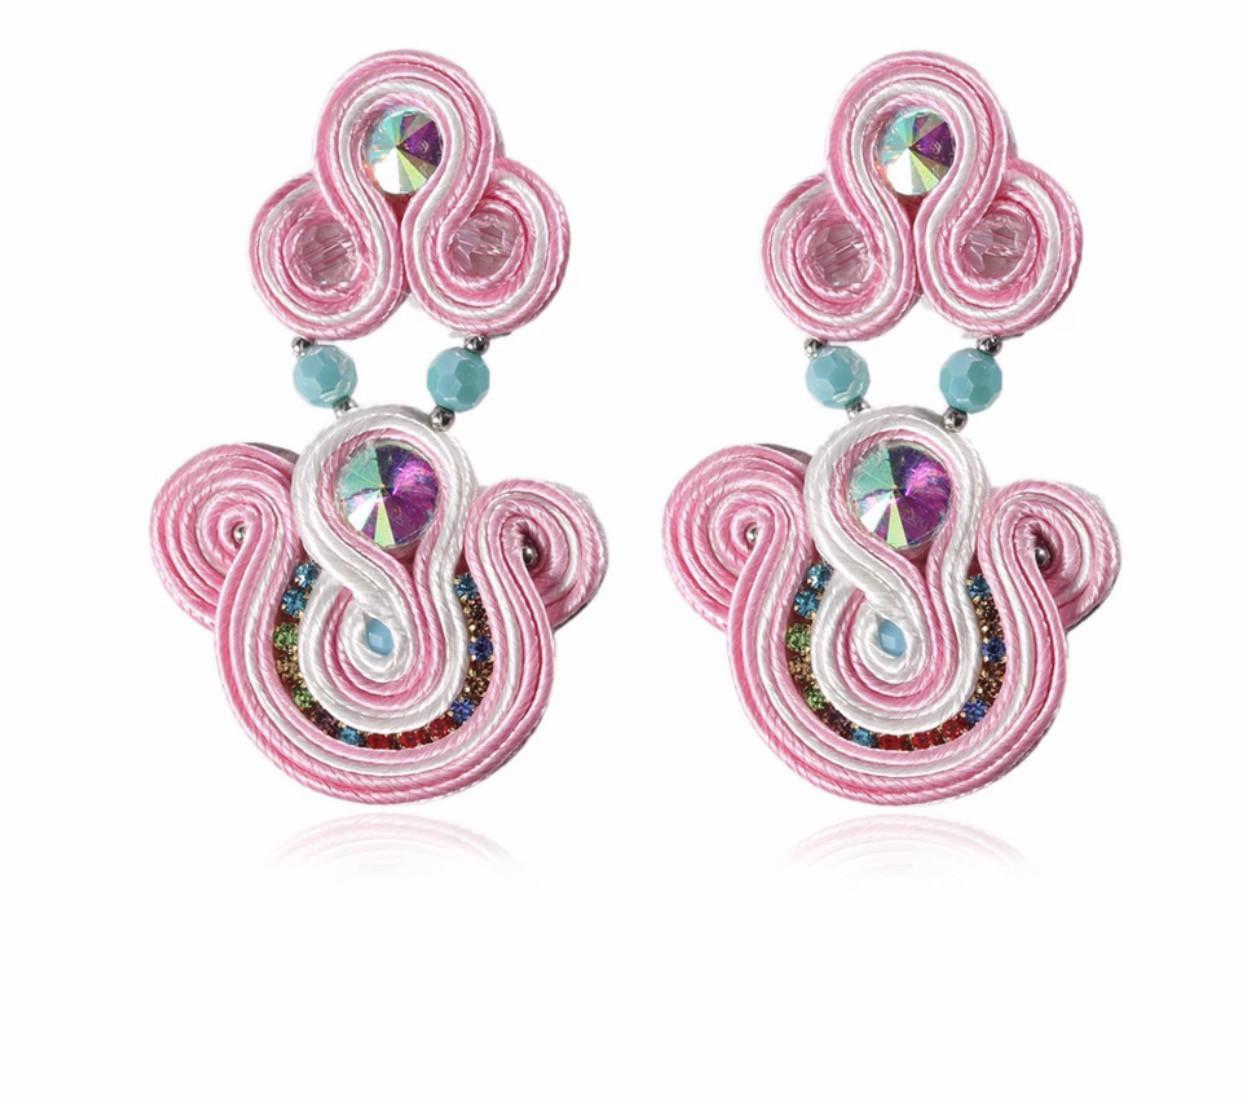 Cynthia Small Earrings